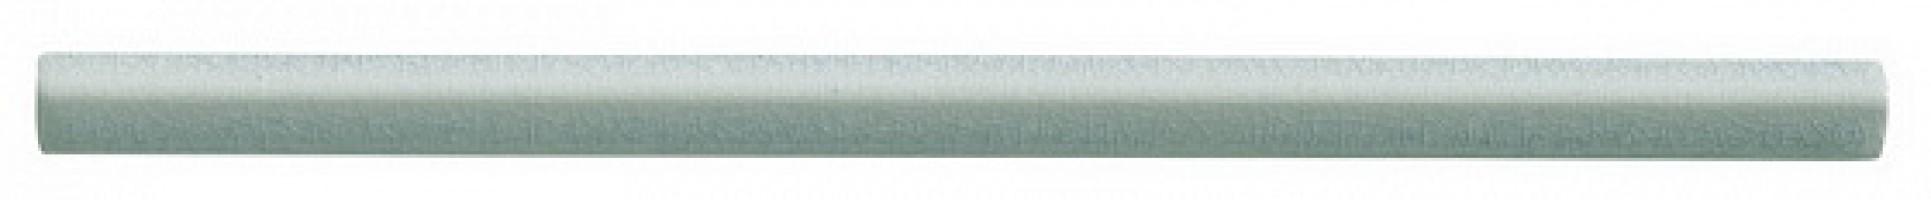 Бордюр Ocean ADOC5091 Bullnose Trim Top Sail 0.85x15 Adex